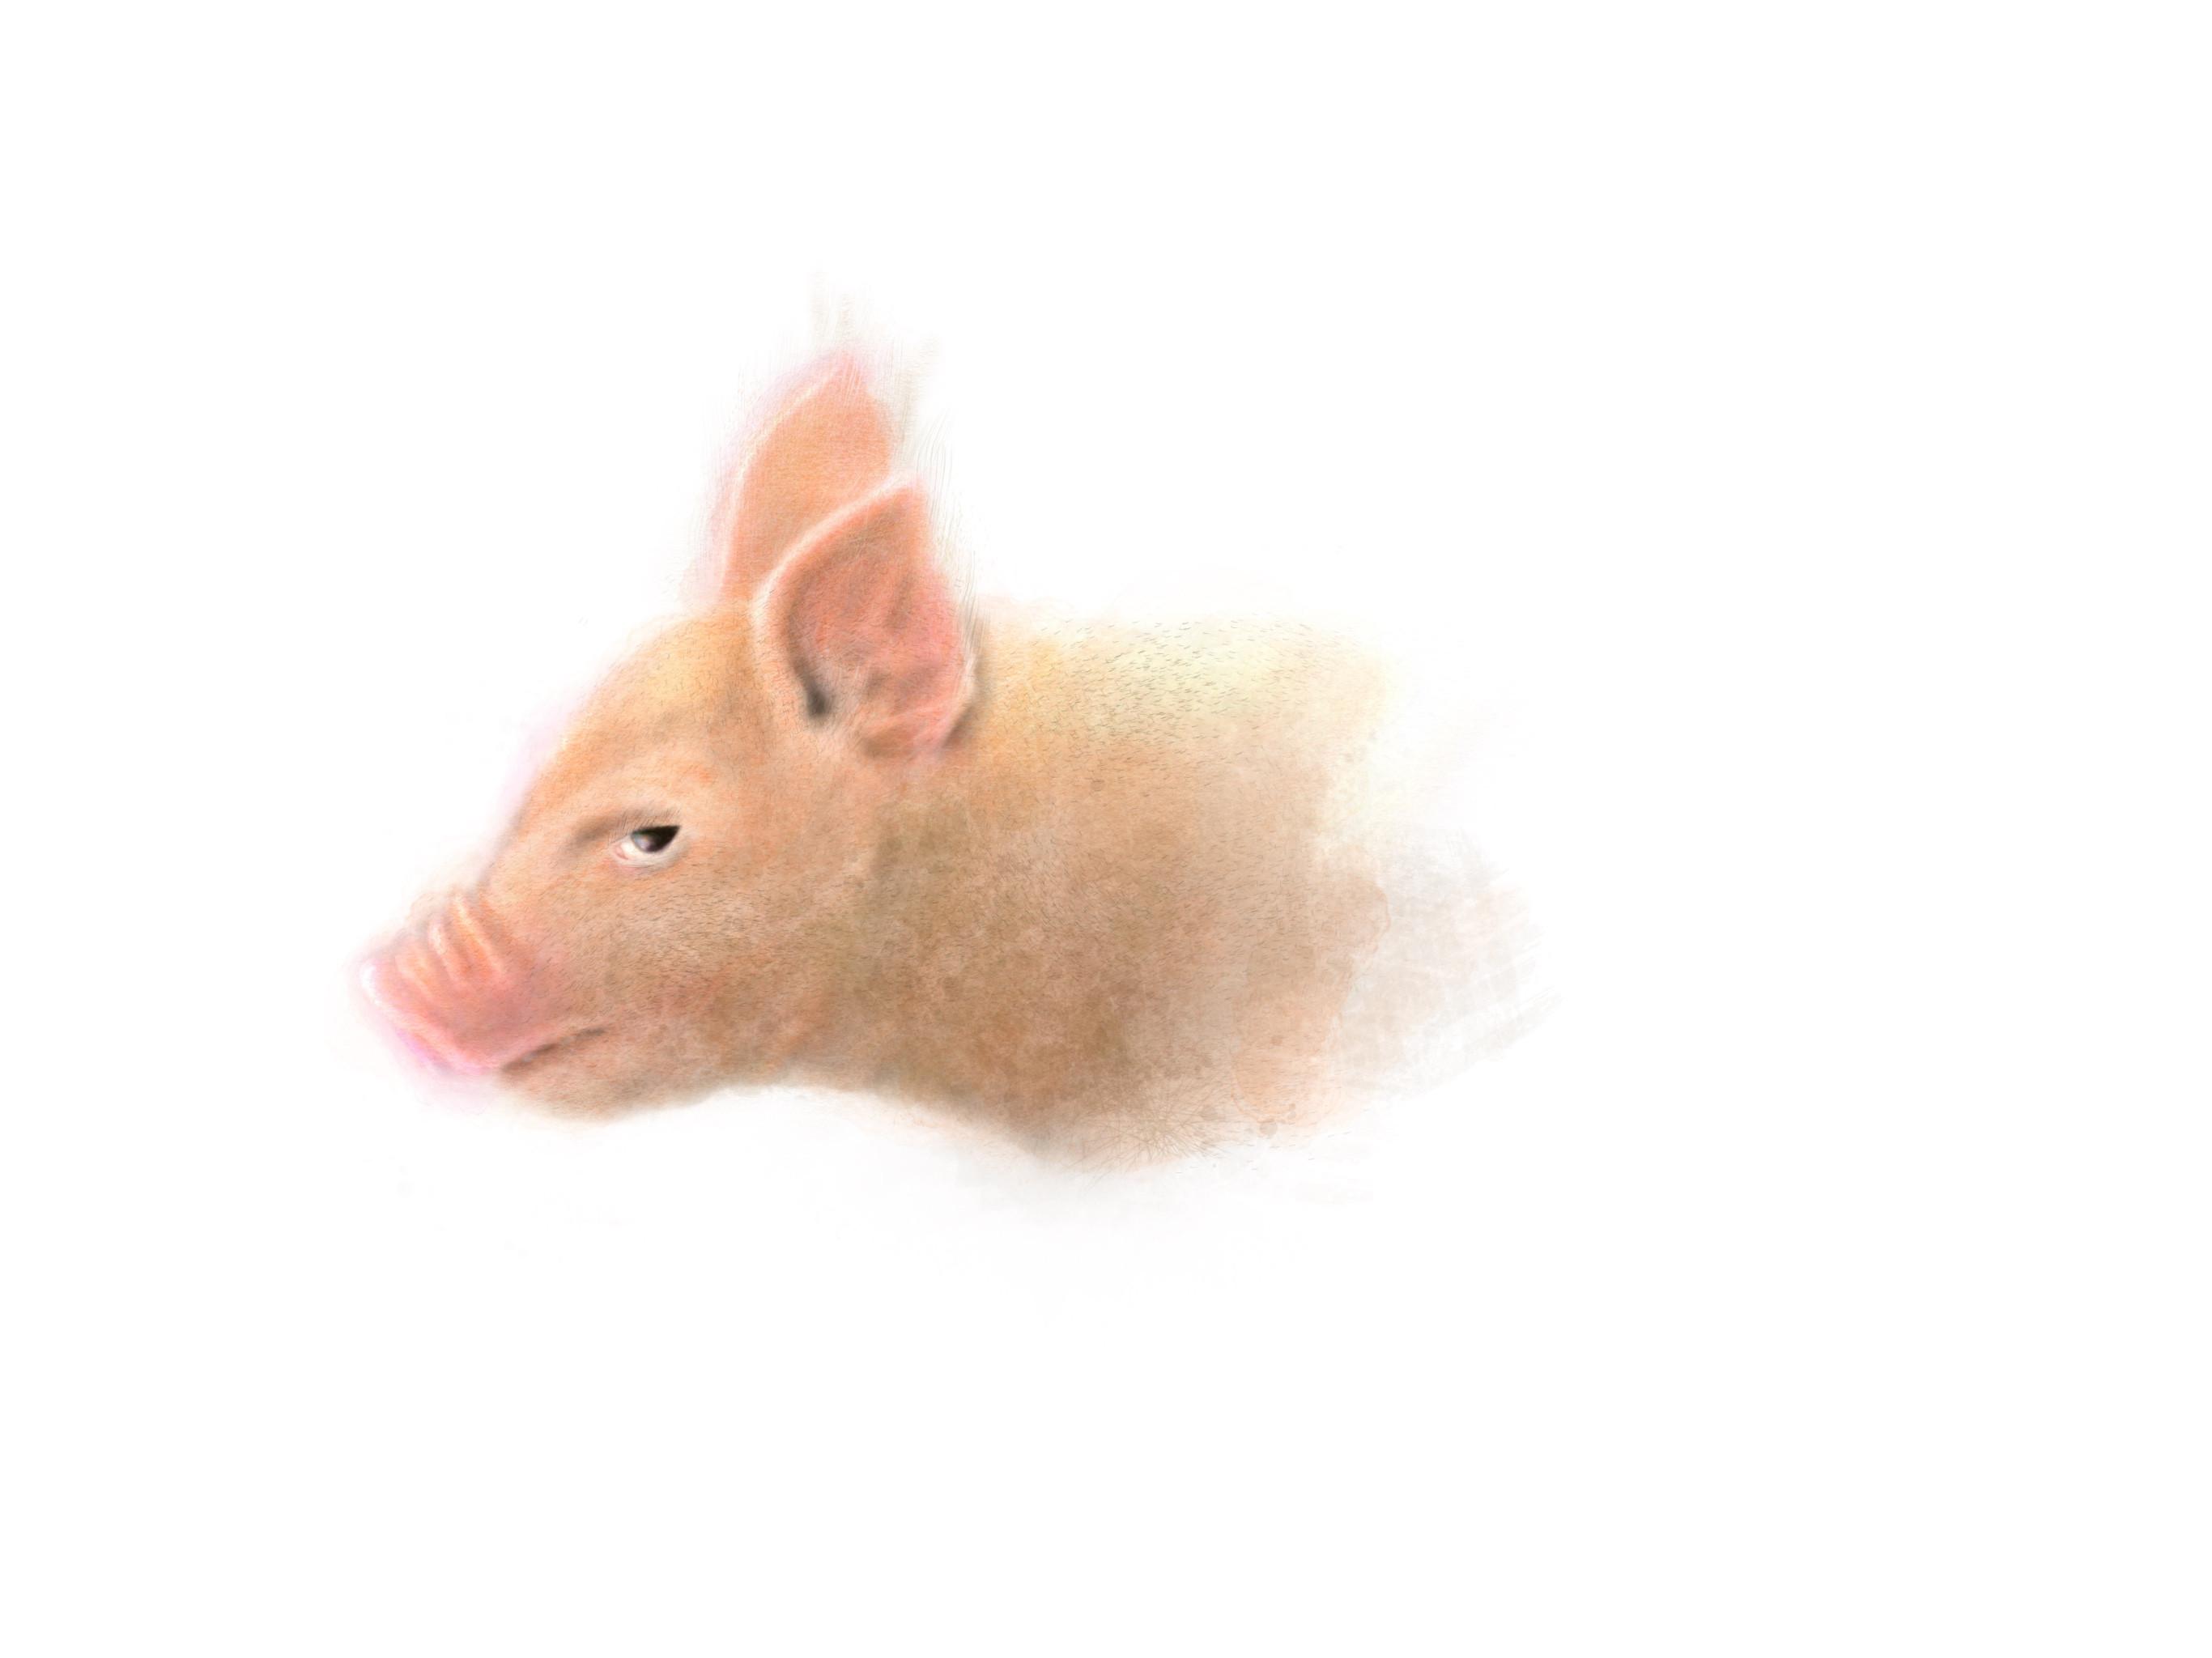 Piglet - Procreate